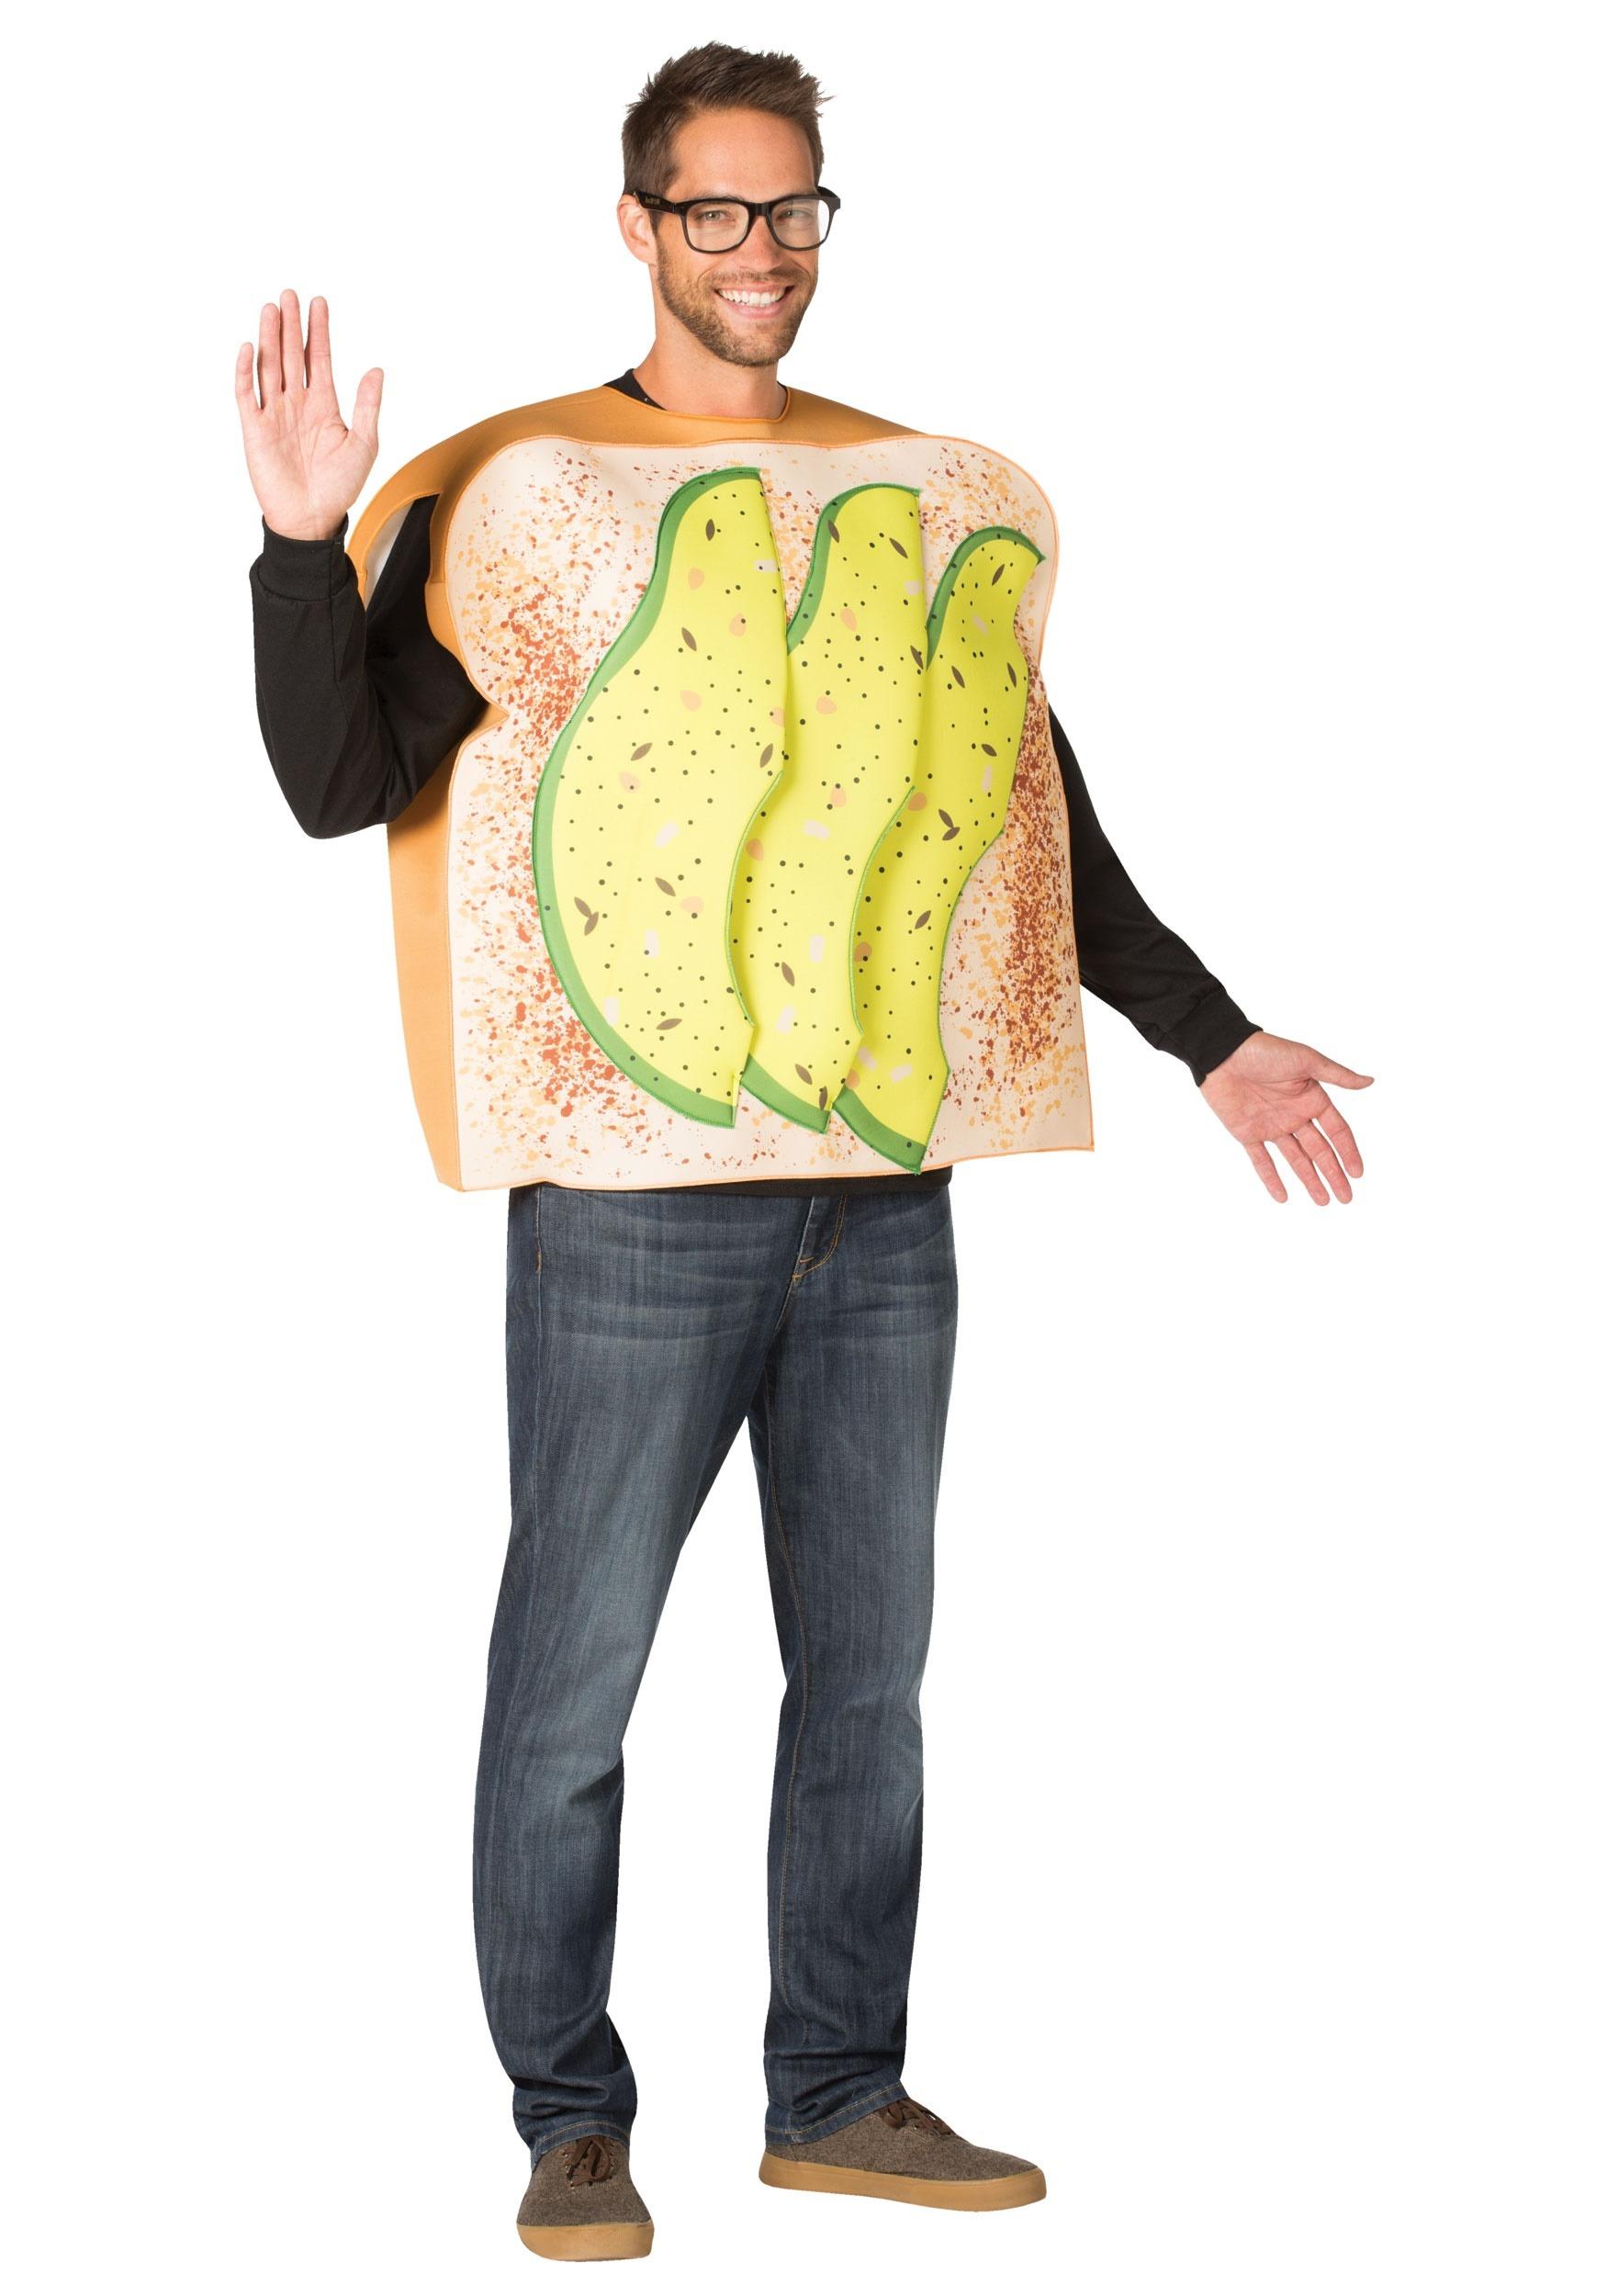 Avocado Toast Costume for Millennials